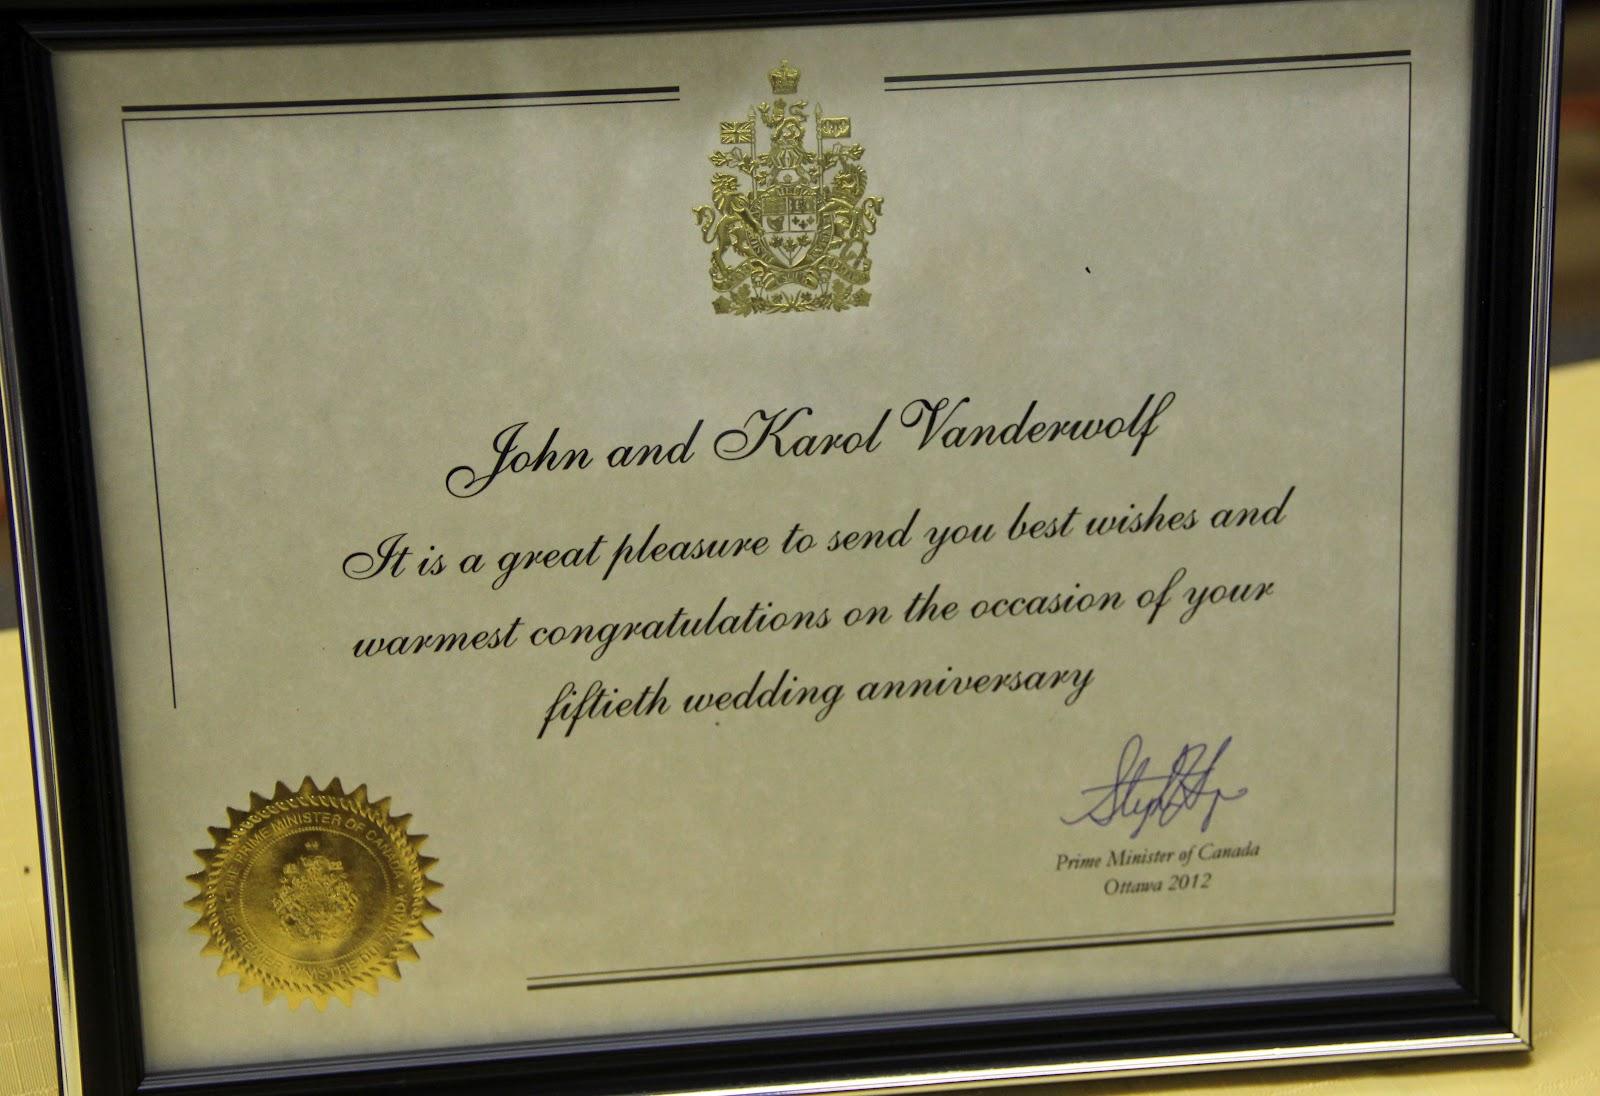 50th Wedding Anniversary Gifts For Parents Canada : Ooooooh! Signed by the Prime Minister! Coooooooool!